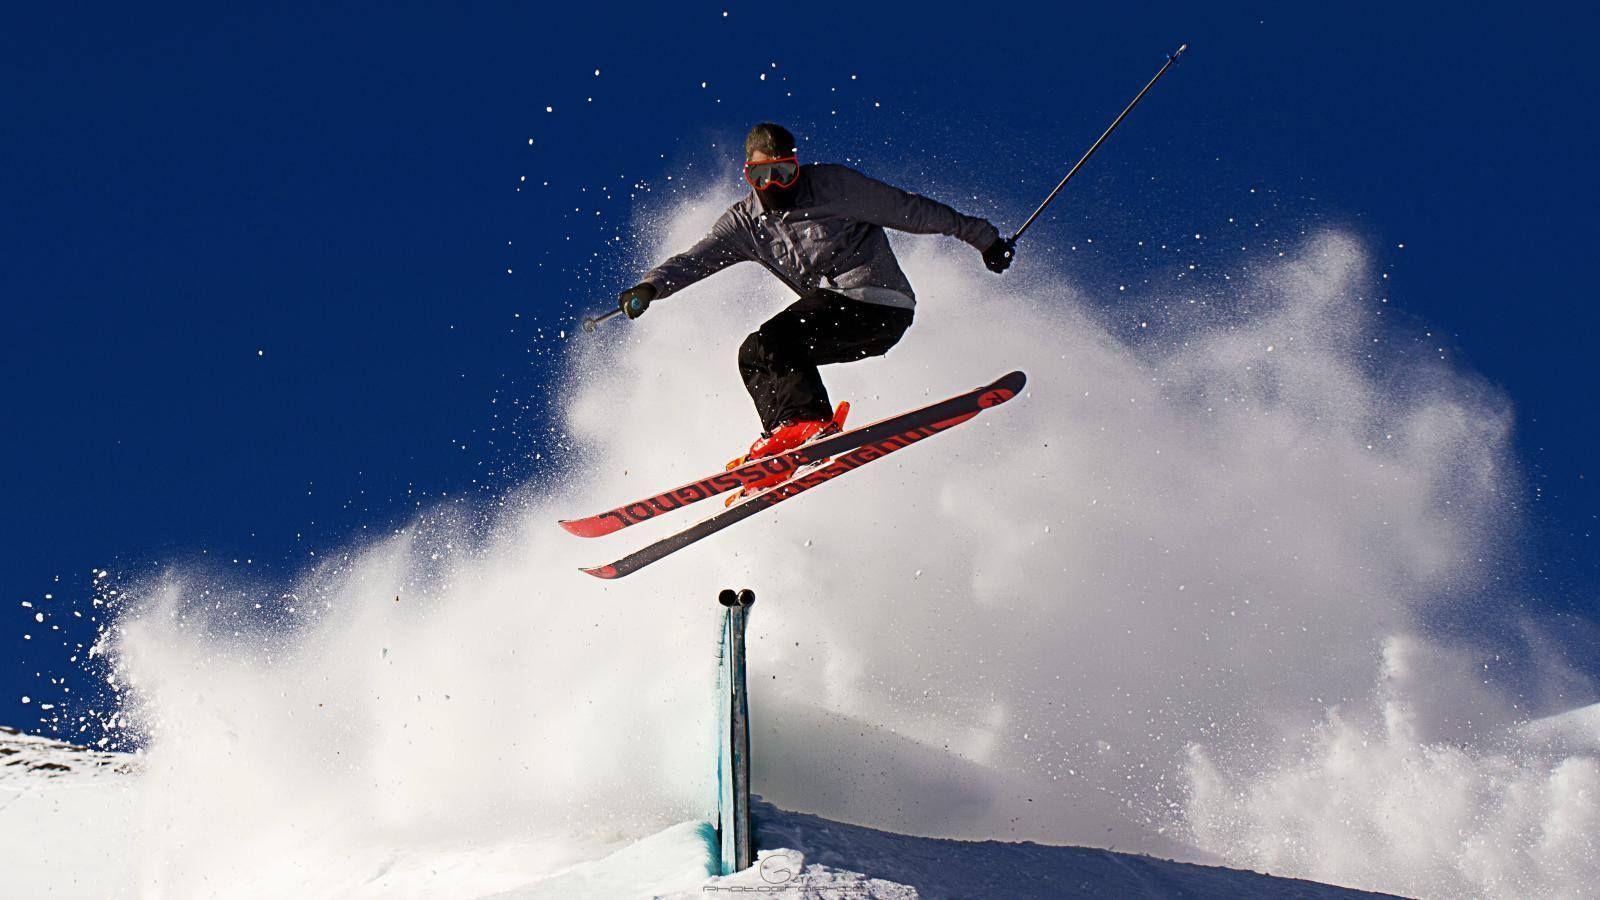 Rossignol Ski Neuheiten für 2017 & 2018: Smart Ski mit PIQ App | Sports Insider Magazin